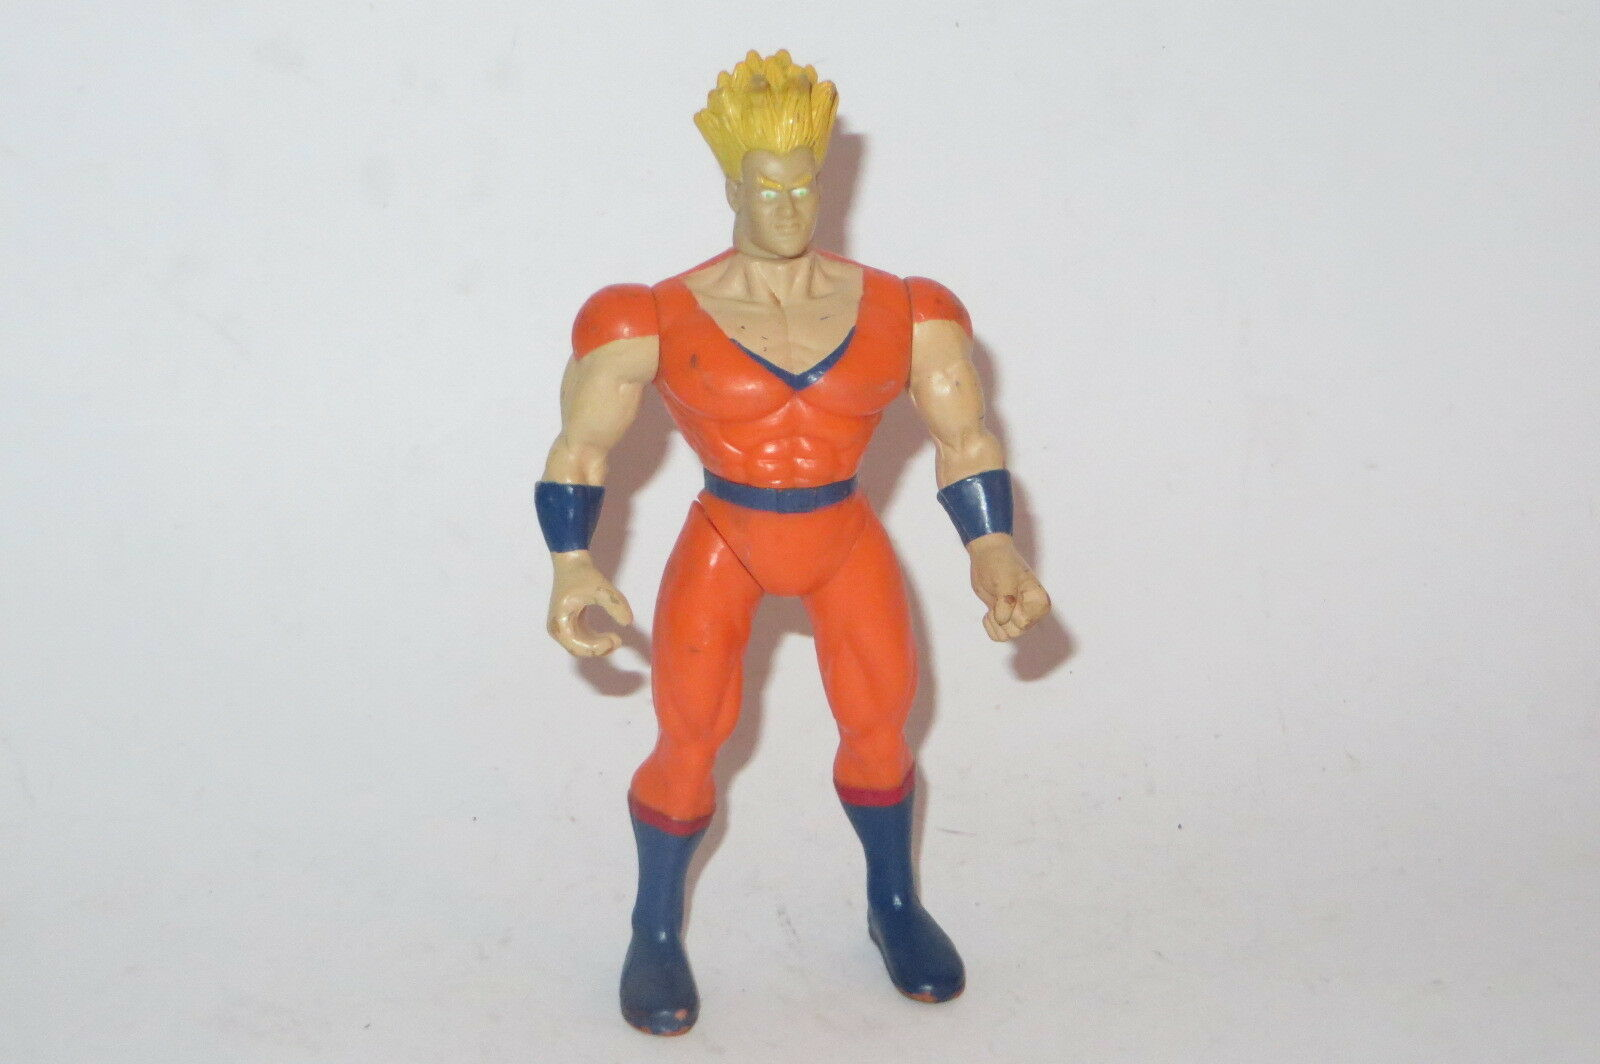 Mannix bootleg KO toy action figure DRAGONBALL Z GOKU motu wwe